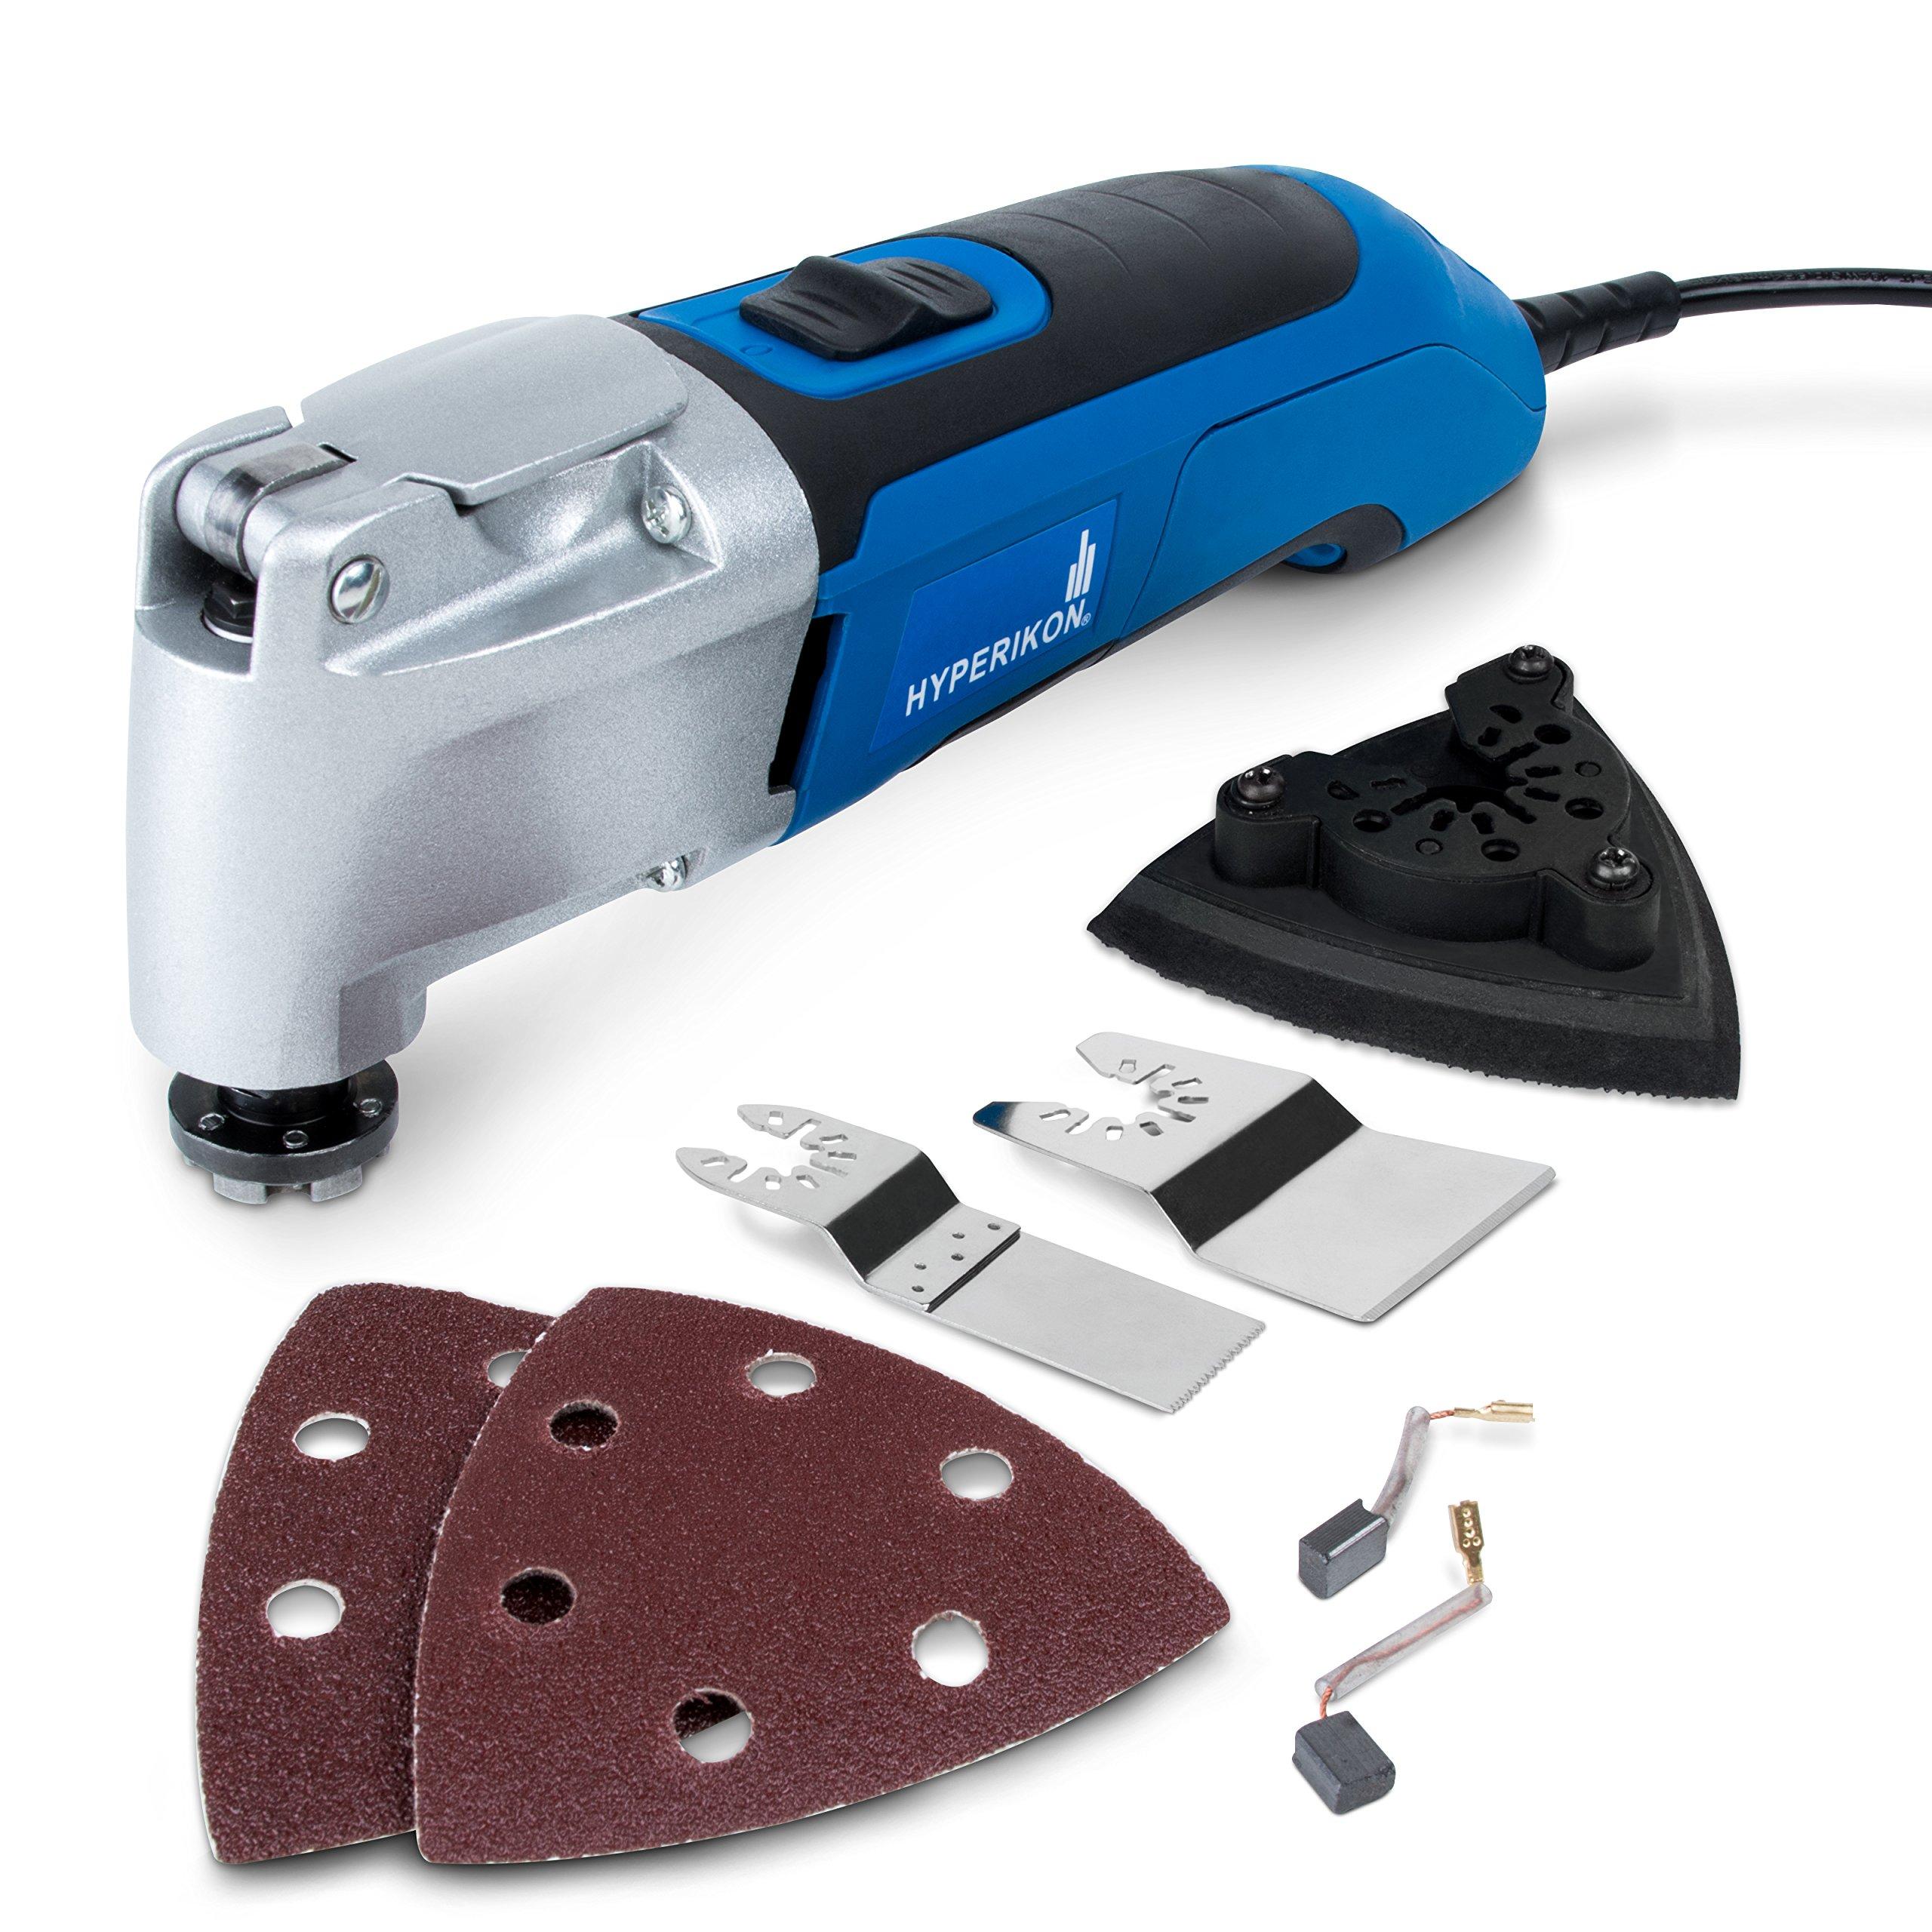 Hyperikon Oscillating Tool Variable Speed, Multipurpose Kit, 120V, 2.5 Amp Power Oscillating Multi-Tool Kit Corded - Quick Release Blade Replacement, Case, Scraper, Blade, Sanding Pad, Sanding Paper